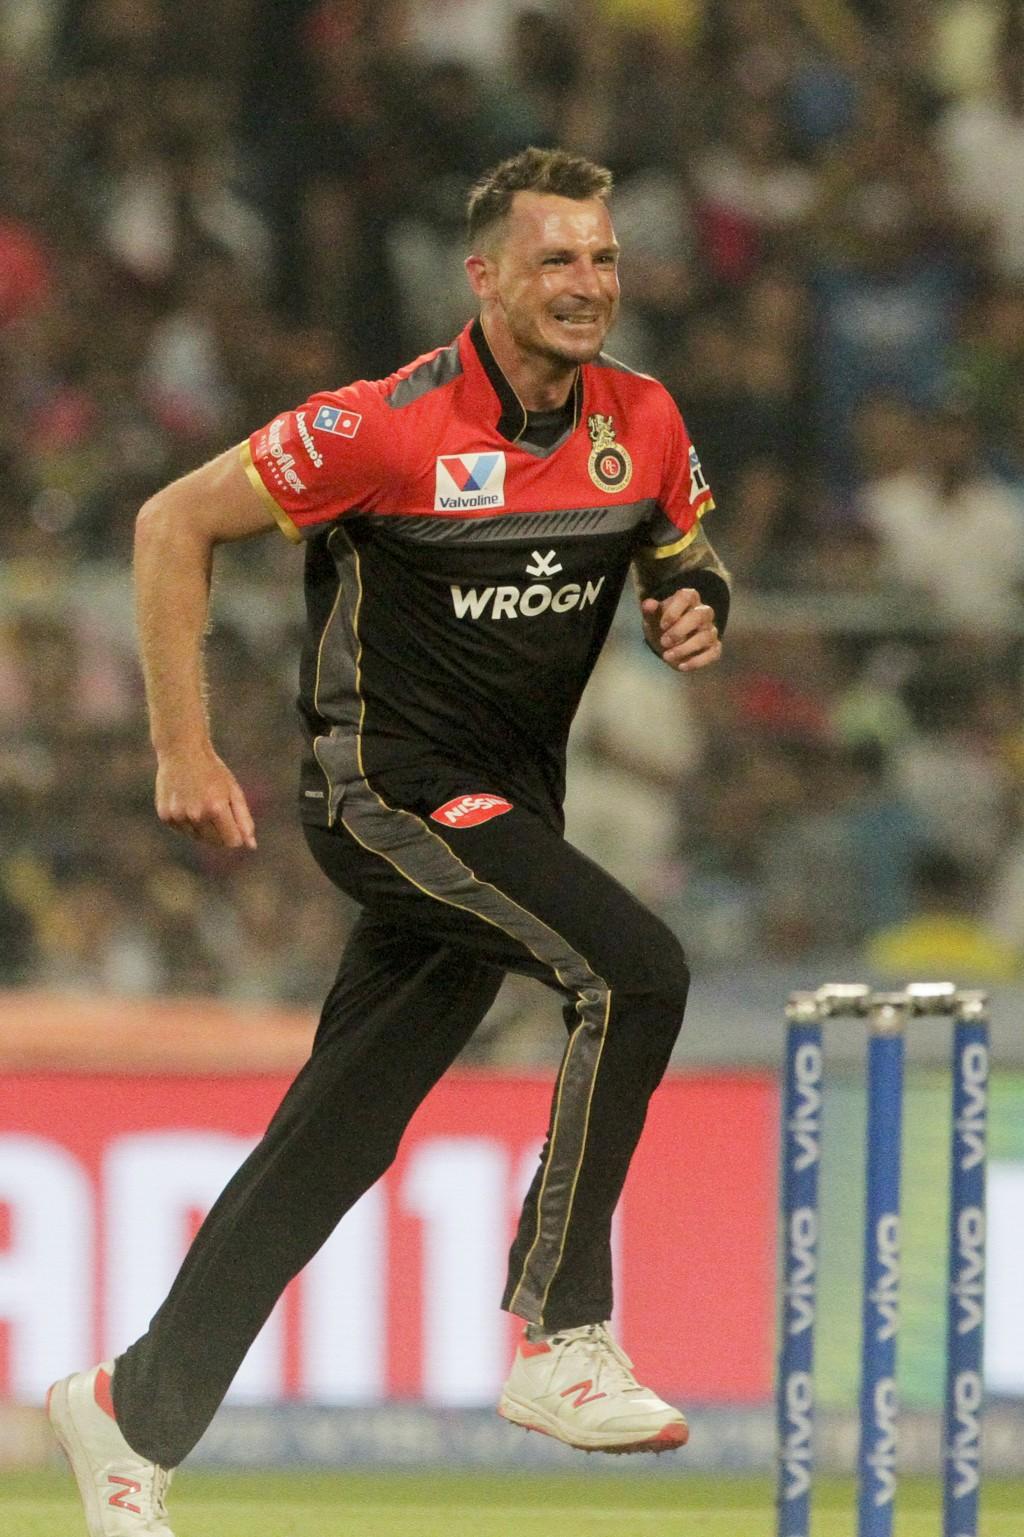 Royal Challengers Bangalore's bowler Dale Steyn celebrates the dismissal of Kolkata Knight Riders' Chris Lynn during the VIVO IPL cricket T20 match in...